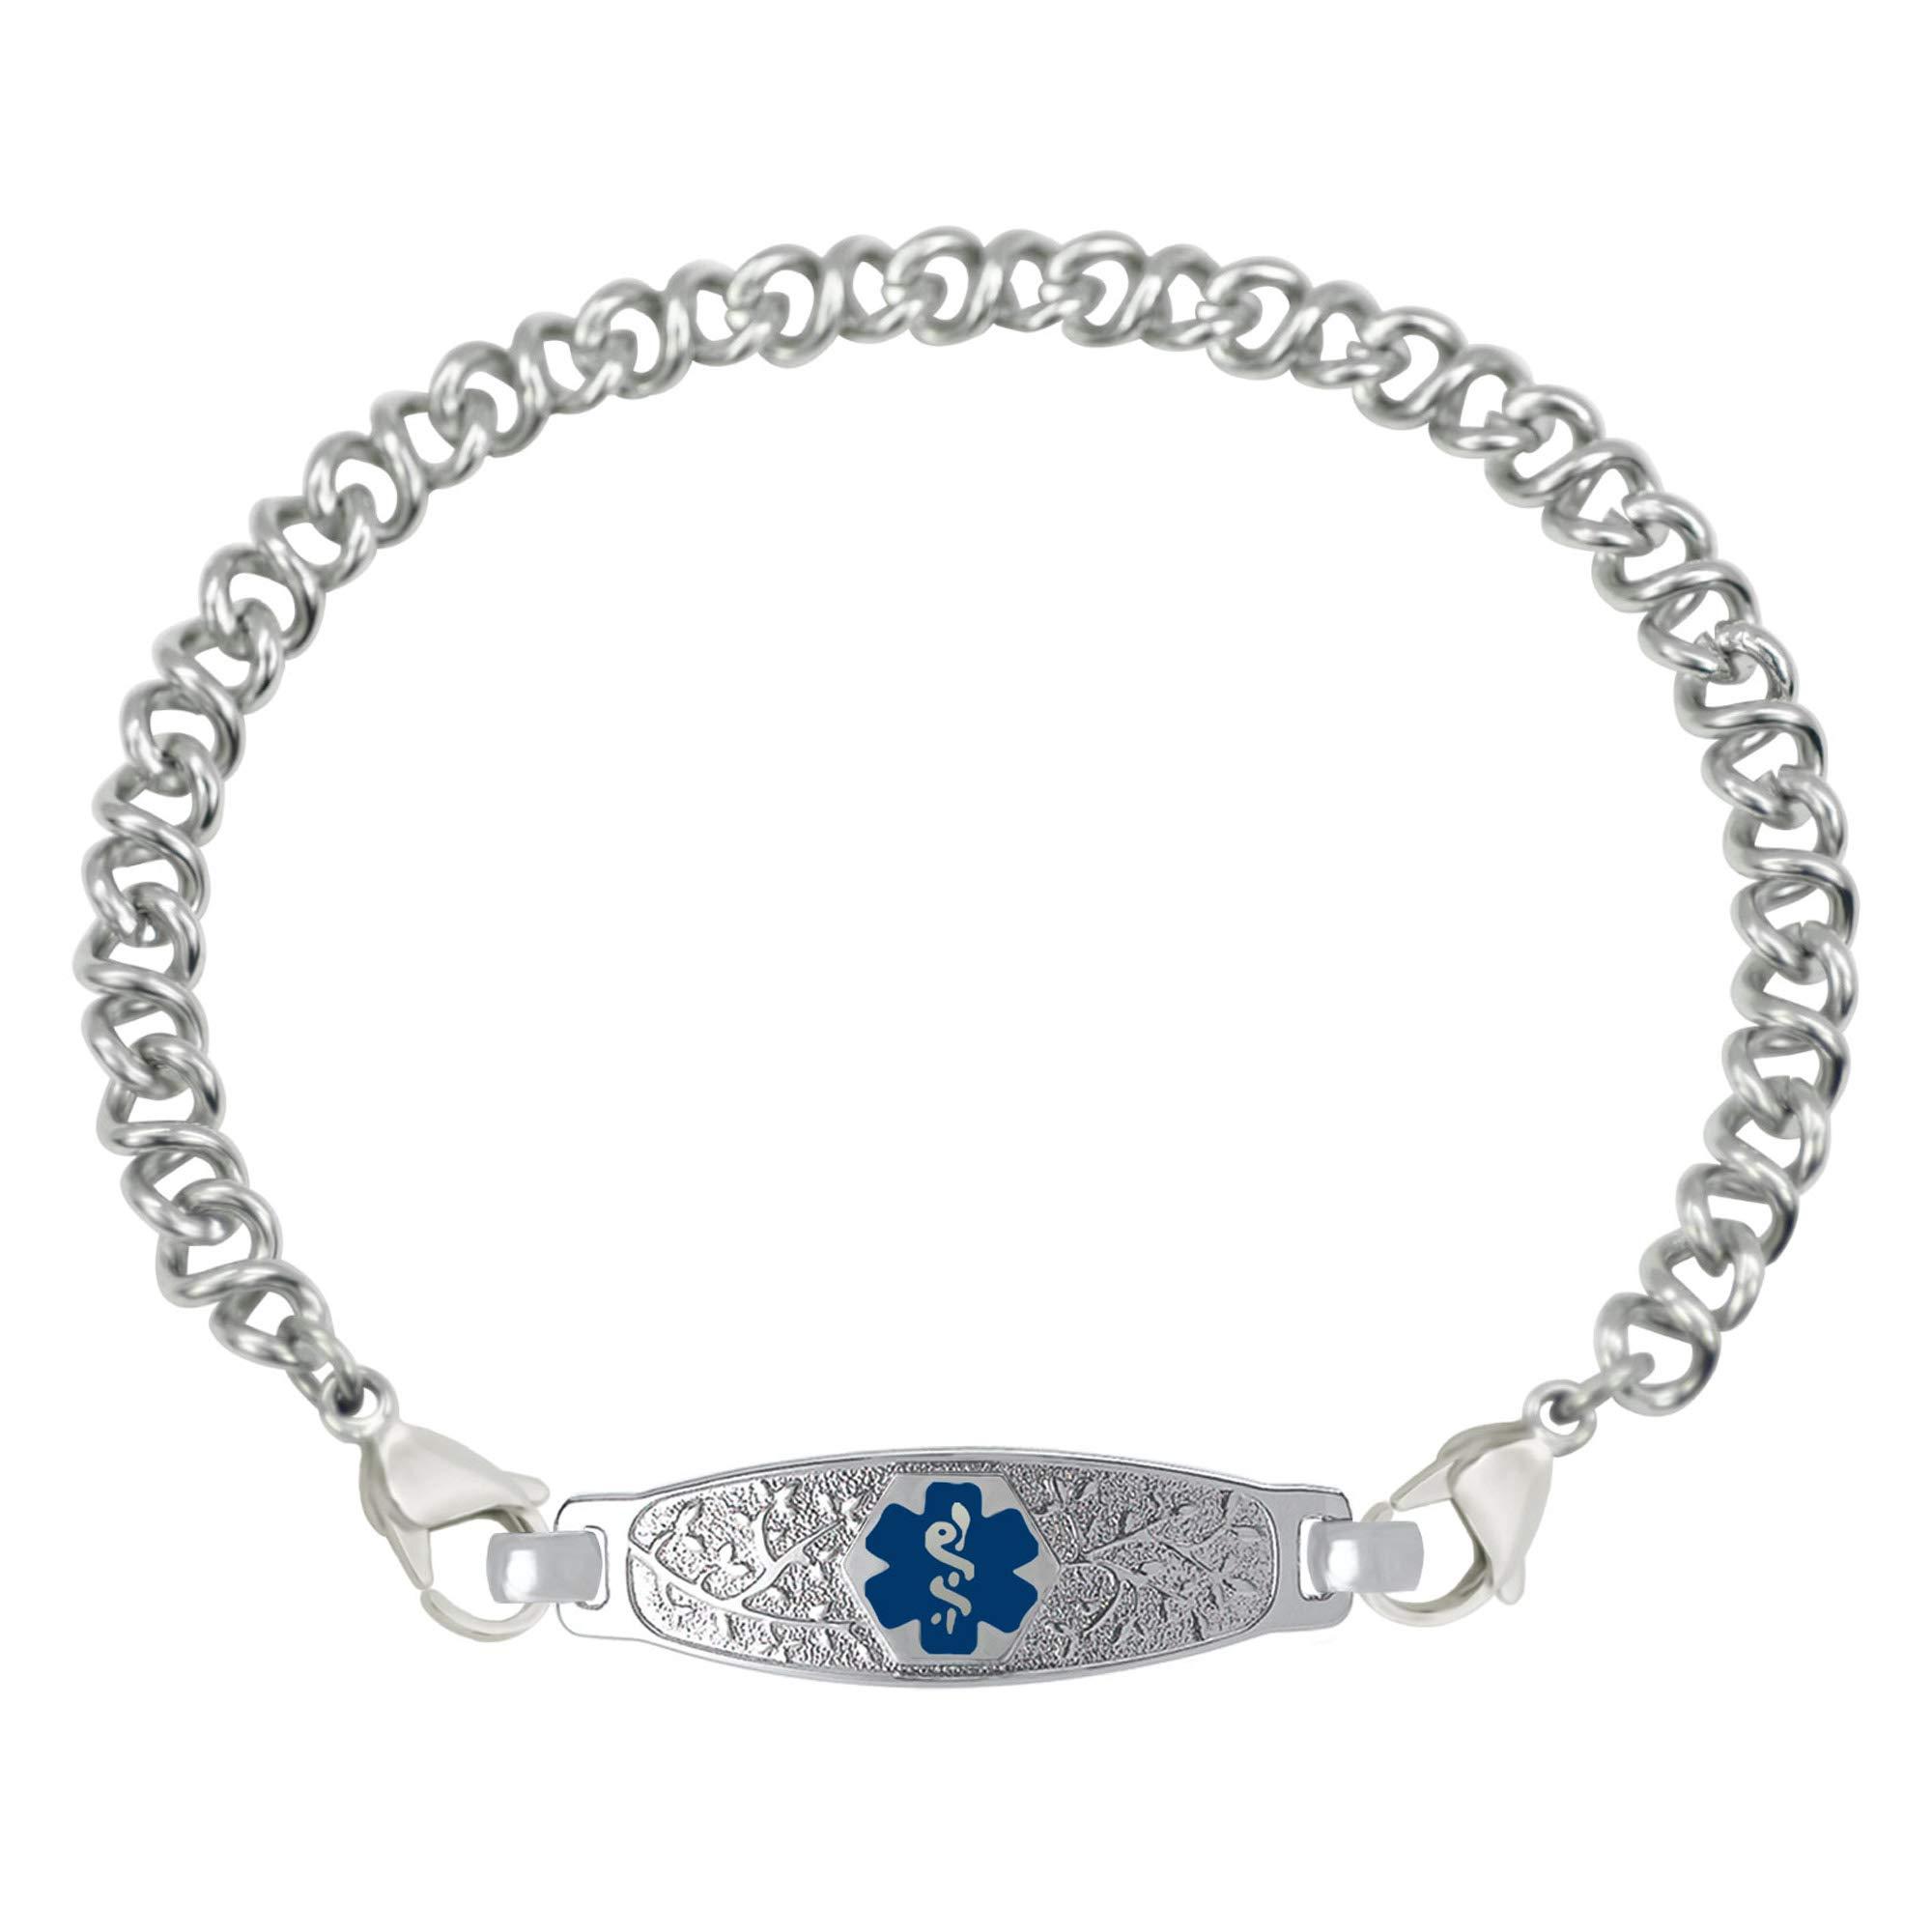 Divoti Custom Engraved Medical Alert Bracelets for Women, Stainless Steel Medical Bracelet, Medical ID Bracelet w/Free Engraving - Beautiful Olive Tag w/Knot Links-Deep Blue-6.5''